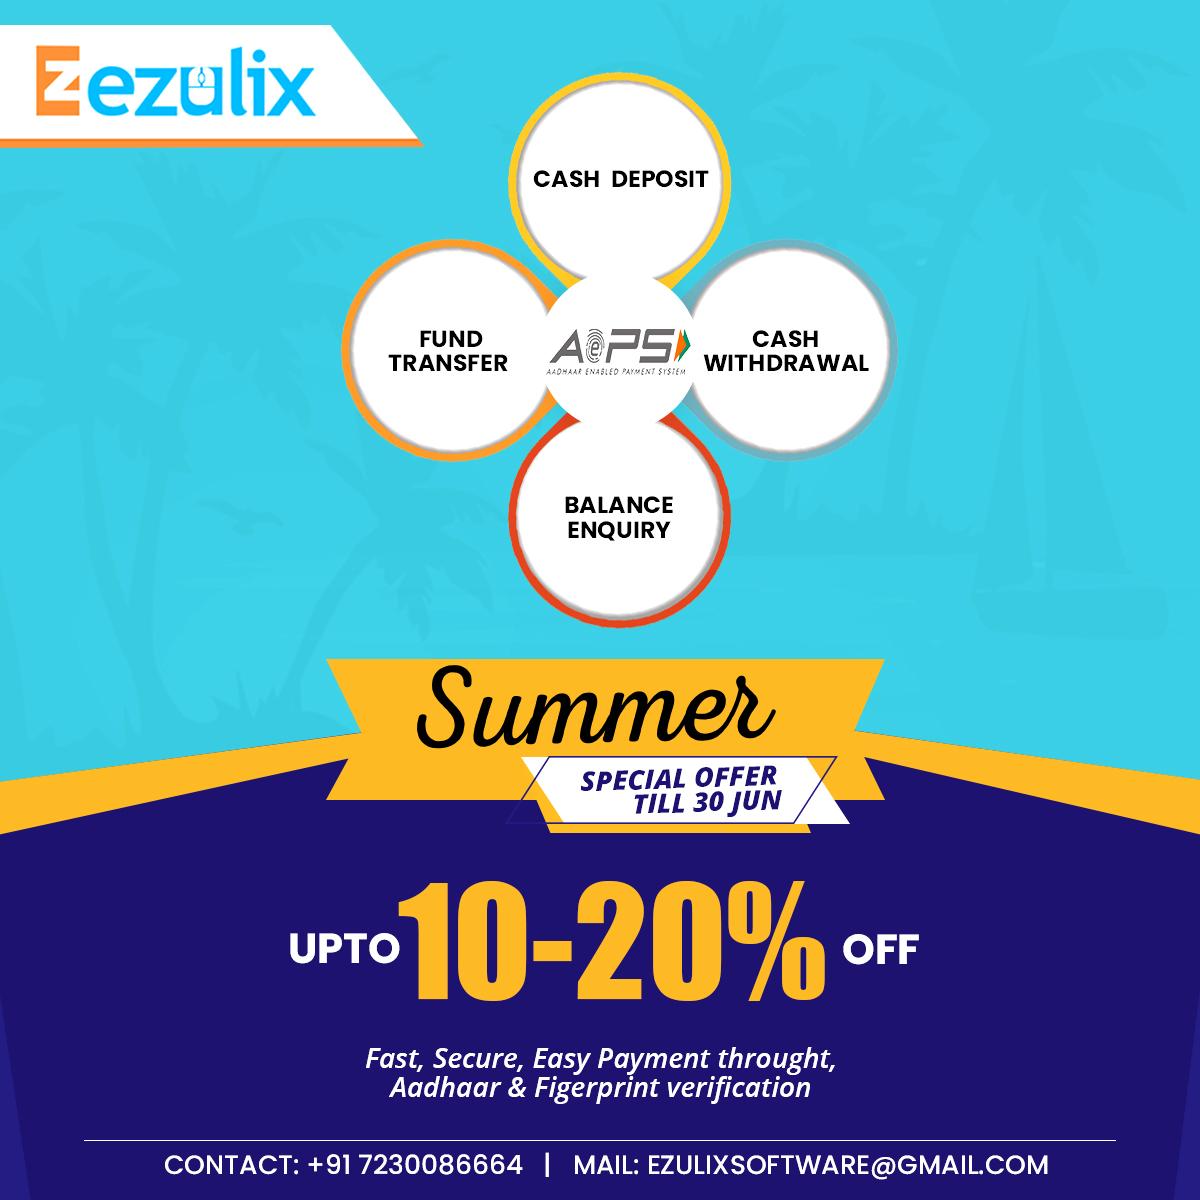 Ezulix - Web Design and Mobile App Development: aeps api